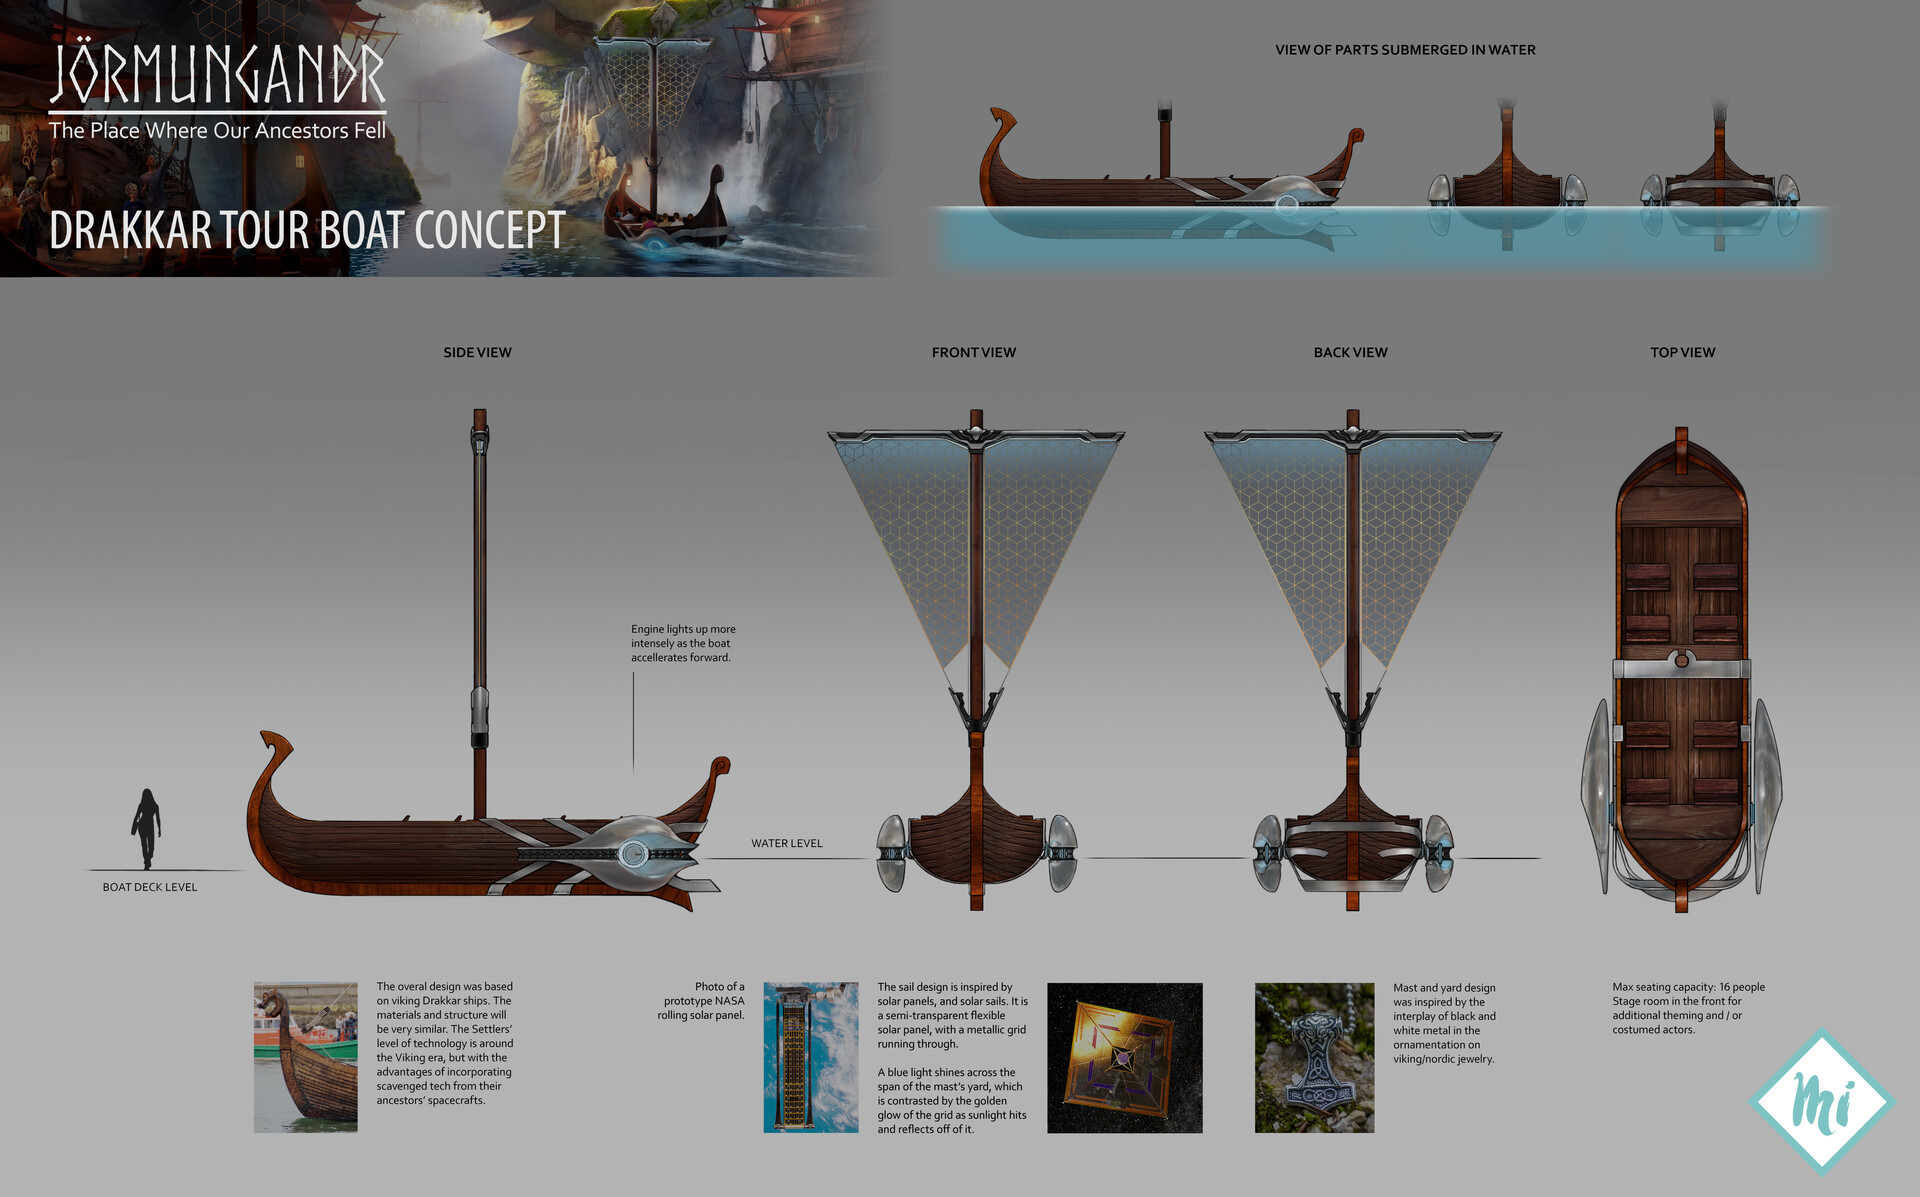 Van lawrence ching jormungandr themepark boatdesign